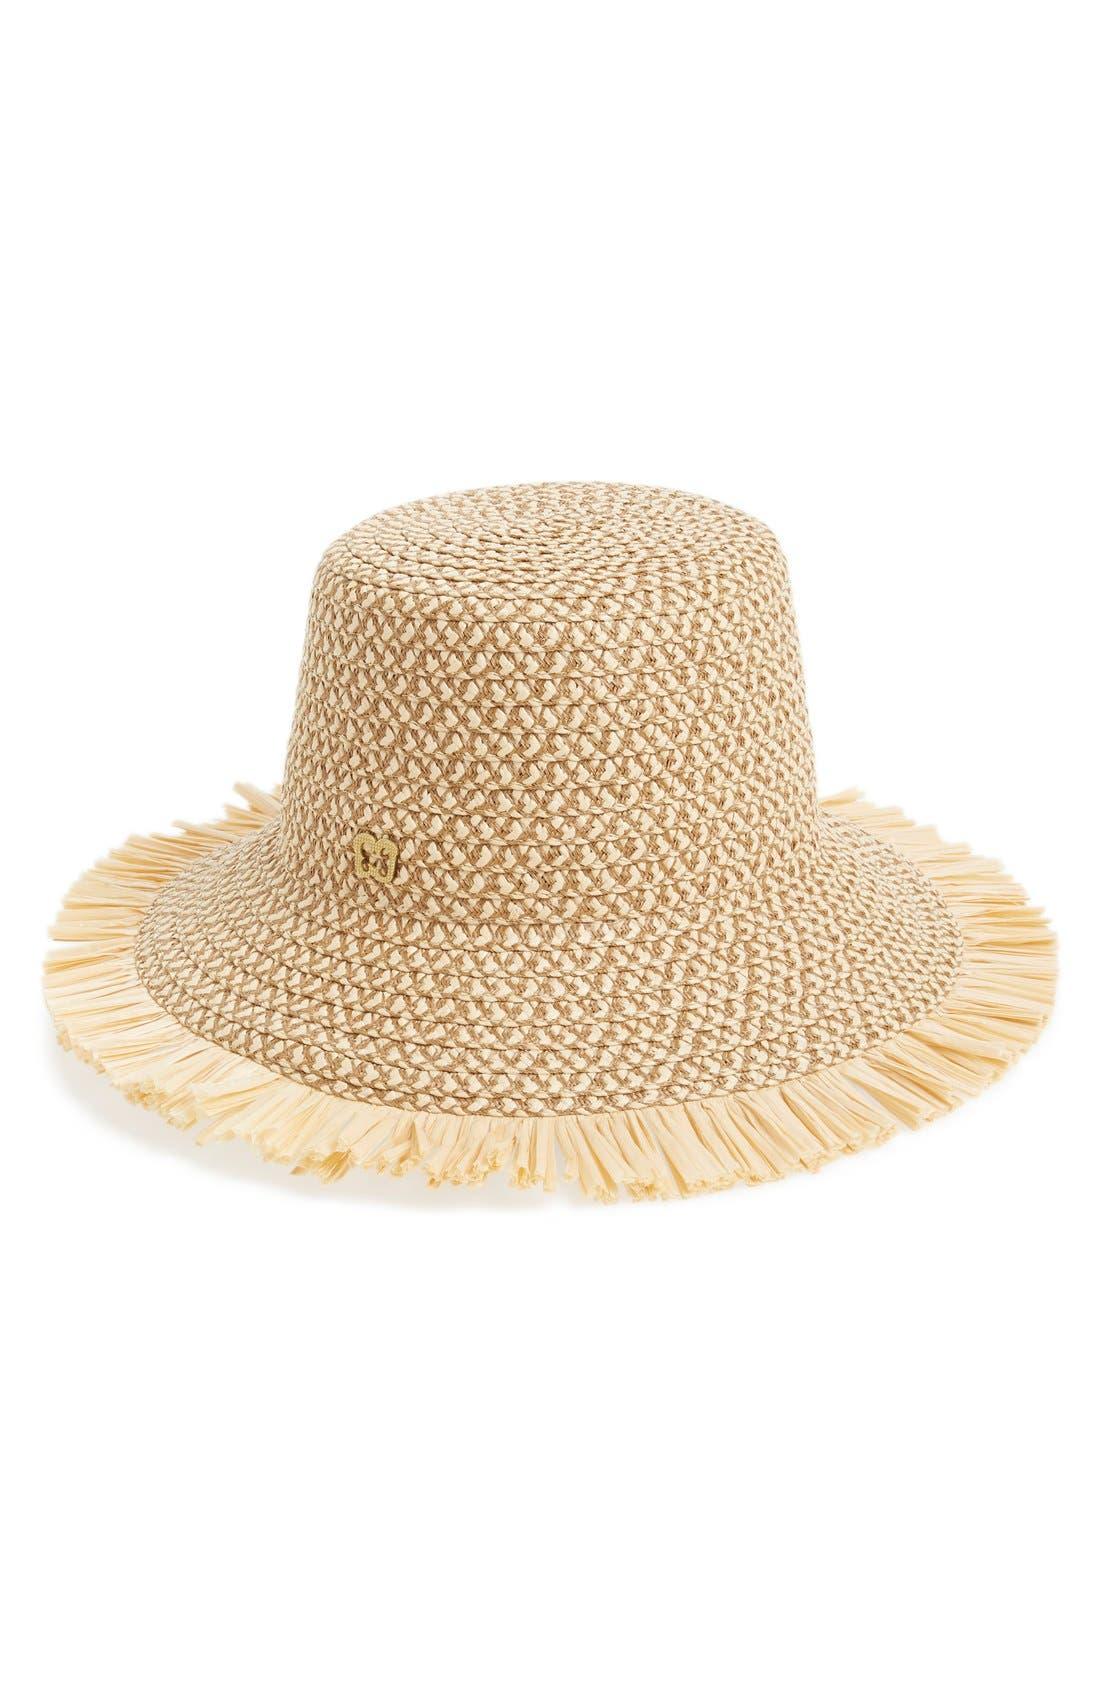 'Tiki' Bucket Hat,                             Main thumbnail 1, color,                             250